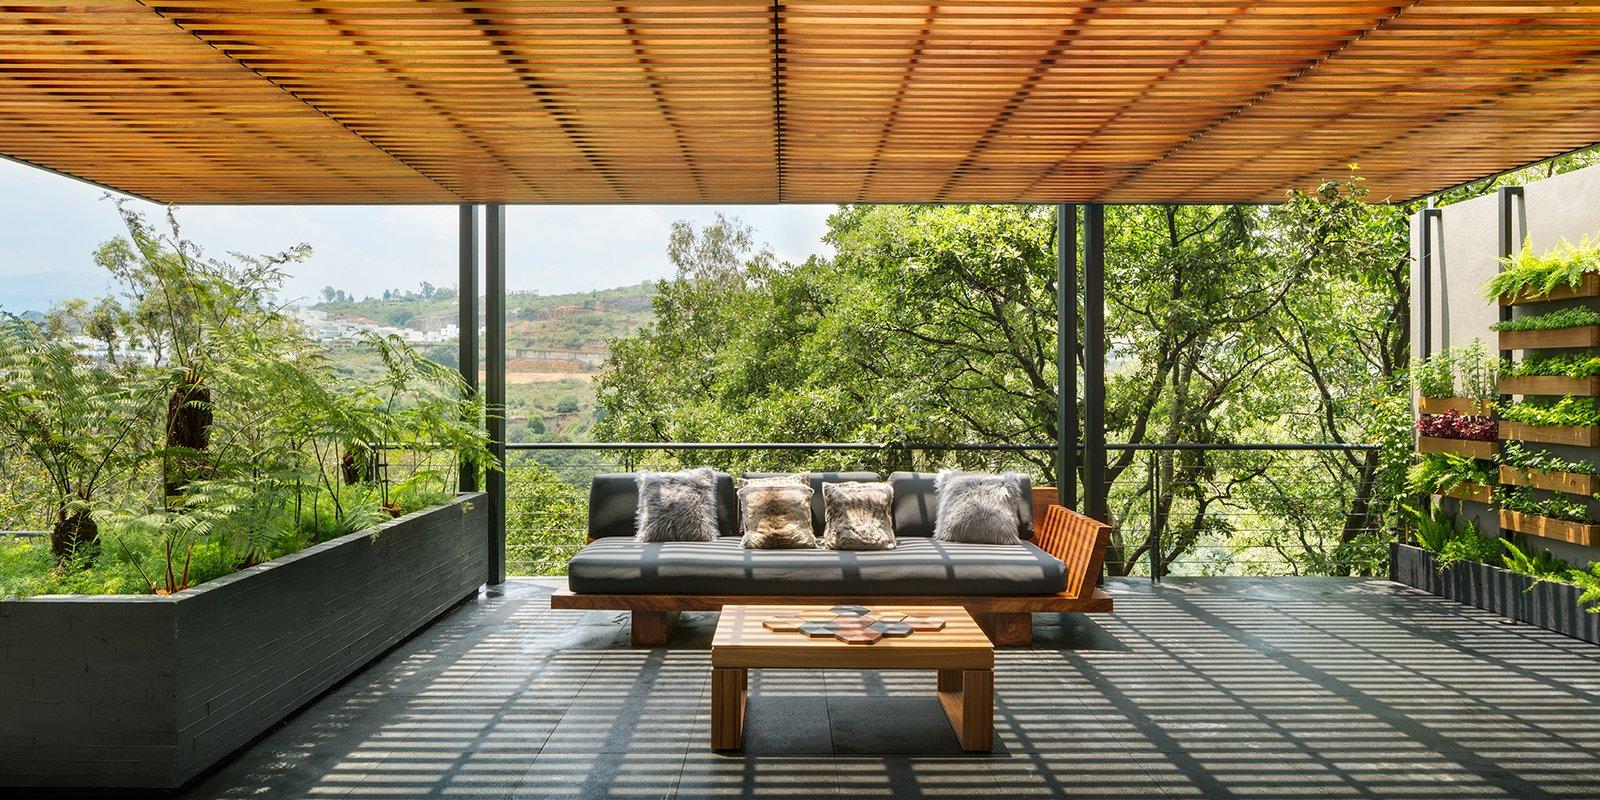 Outdoor, Trees, Shrubs, and Rooftop  Villa Jardín by ASP Arquitectura Sergio Portillo